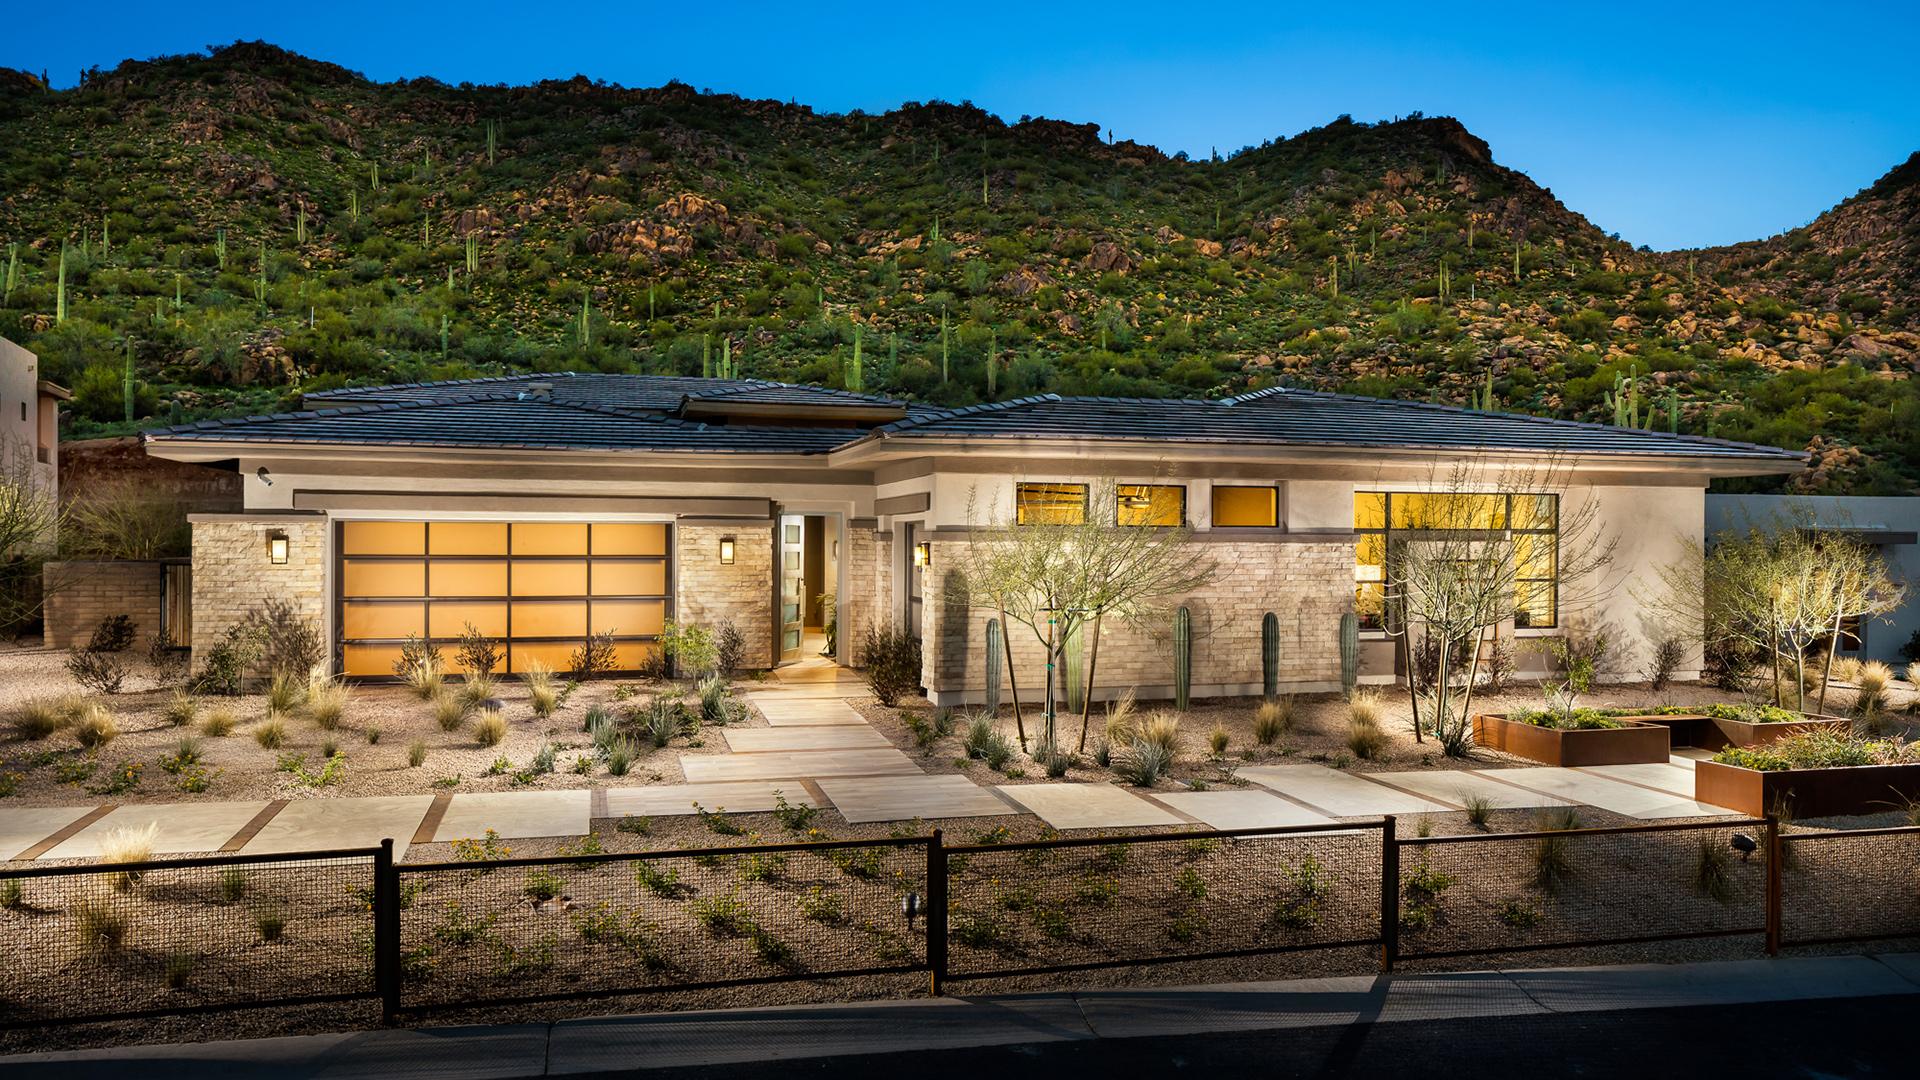 Award-winning home designs with distinct desert contemporary, modern, and prairie architecture